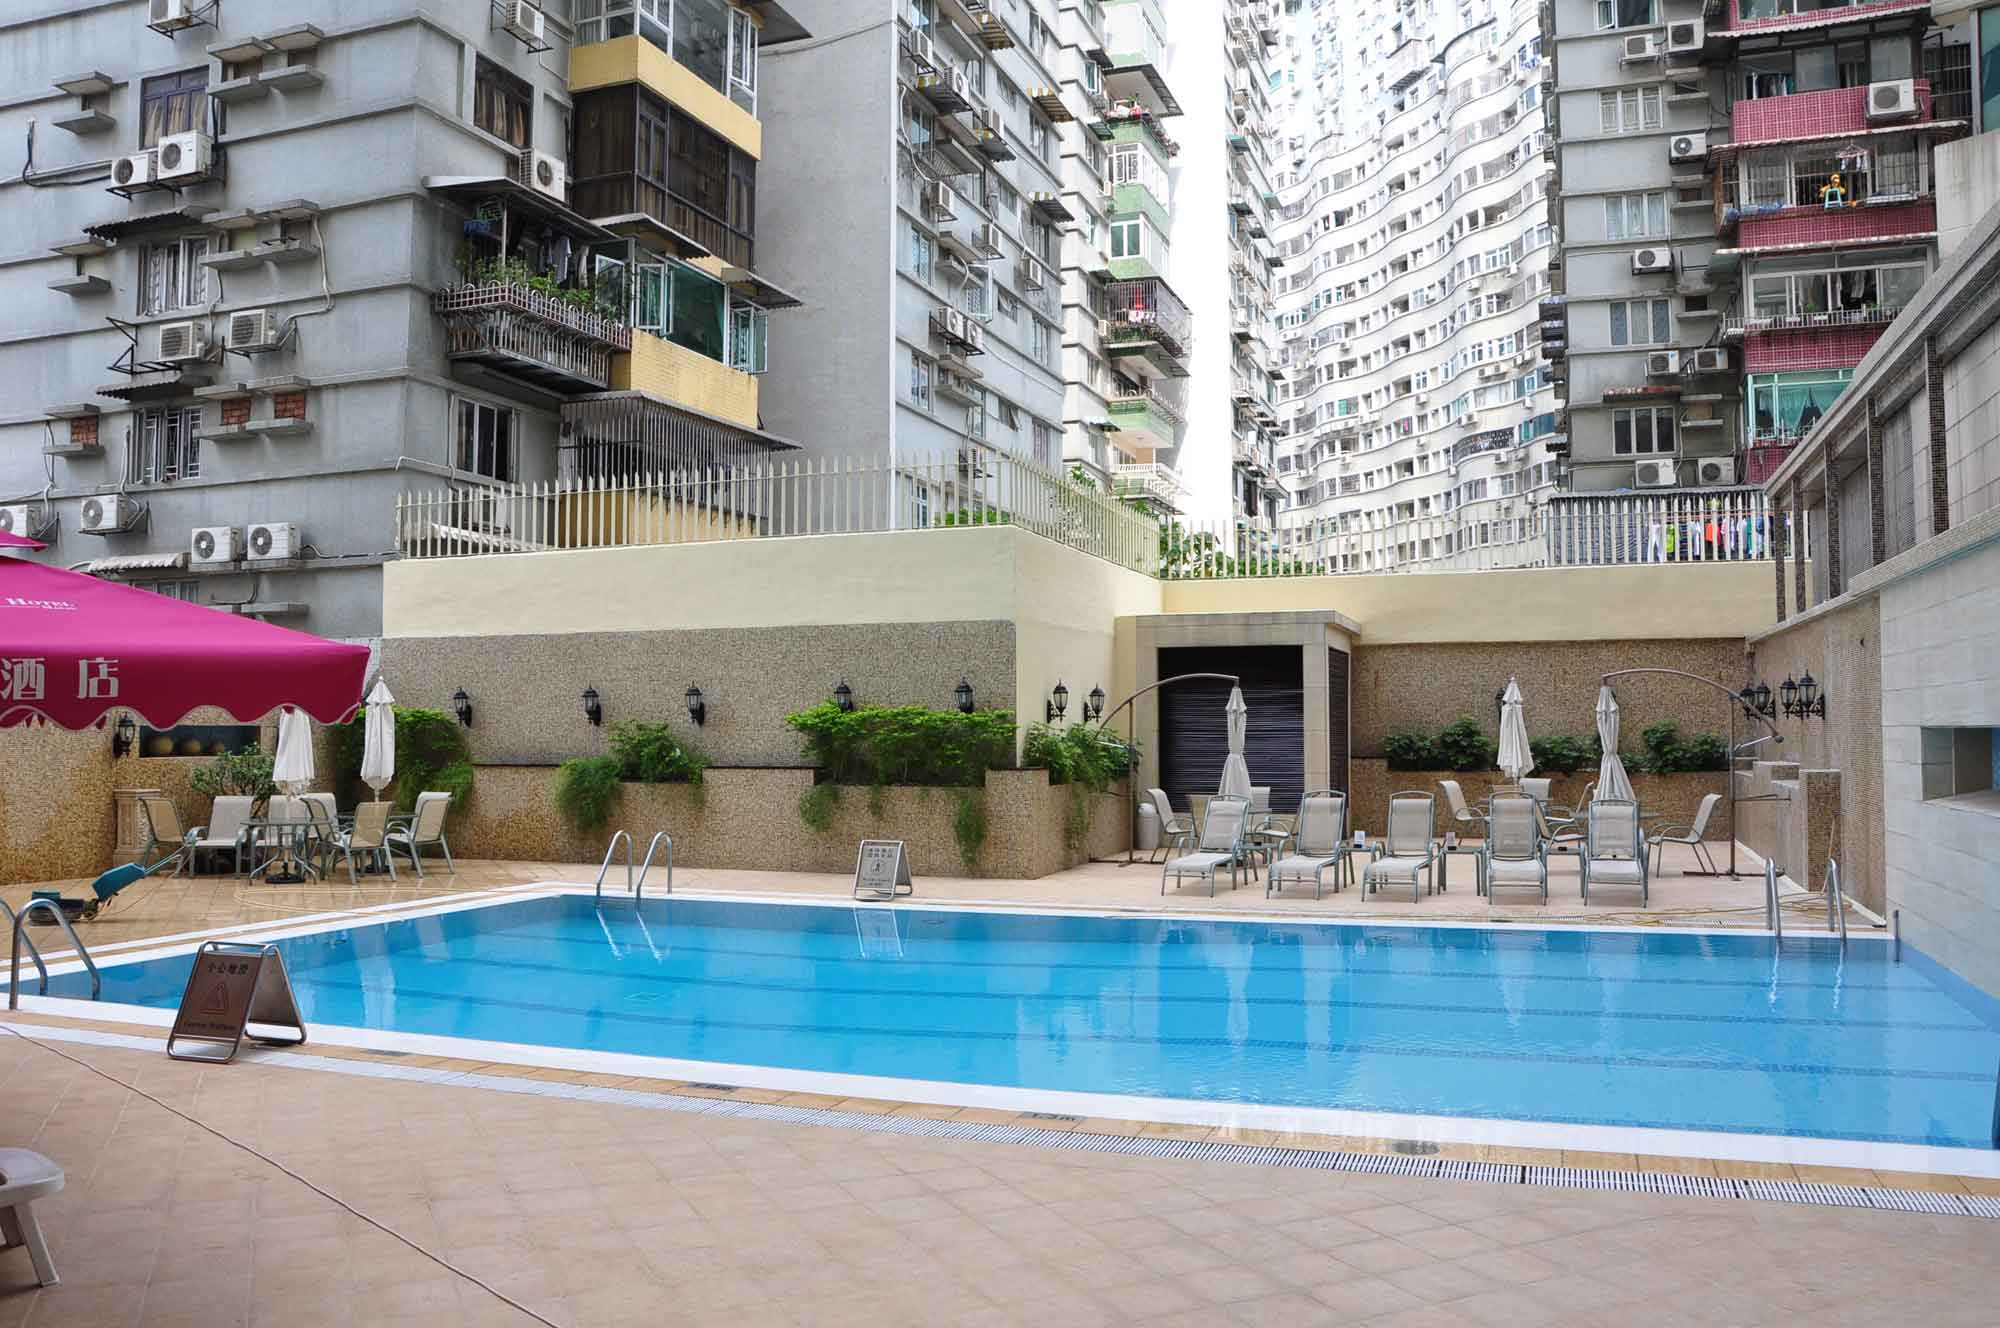 Grandview Hotel Macau outdoor pool and deck